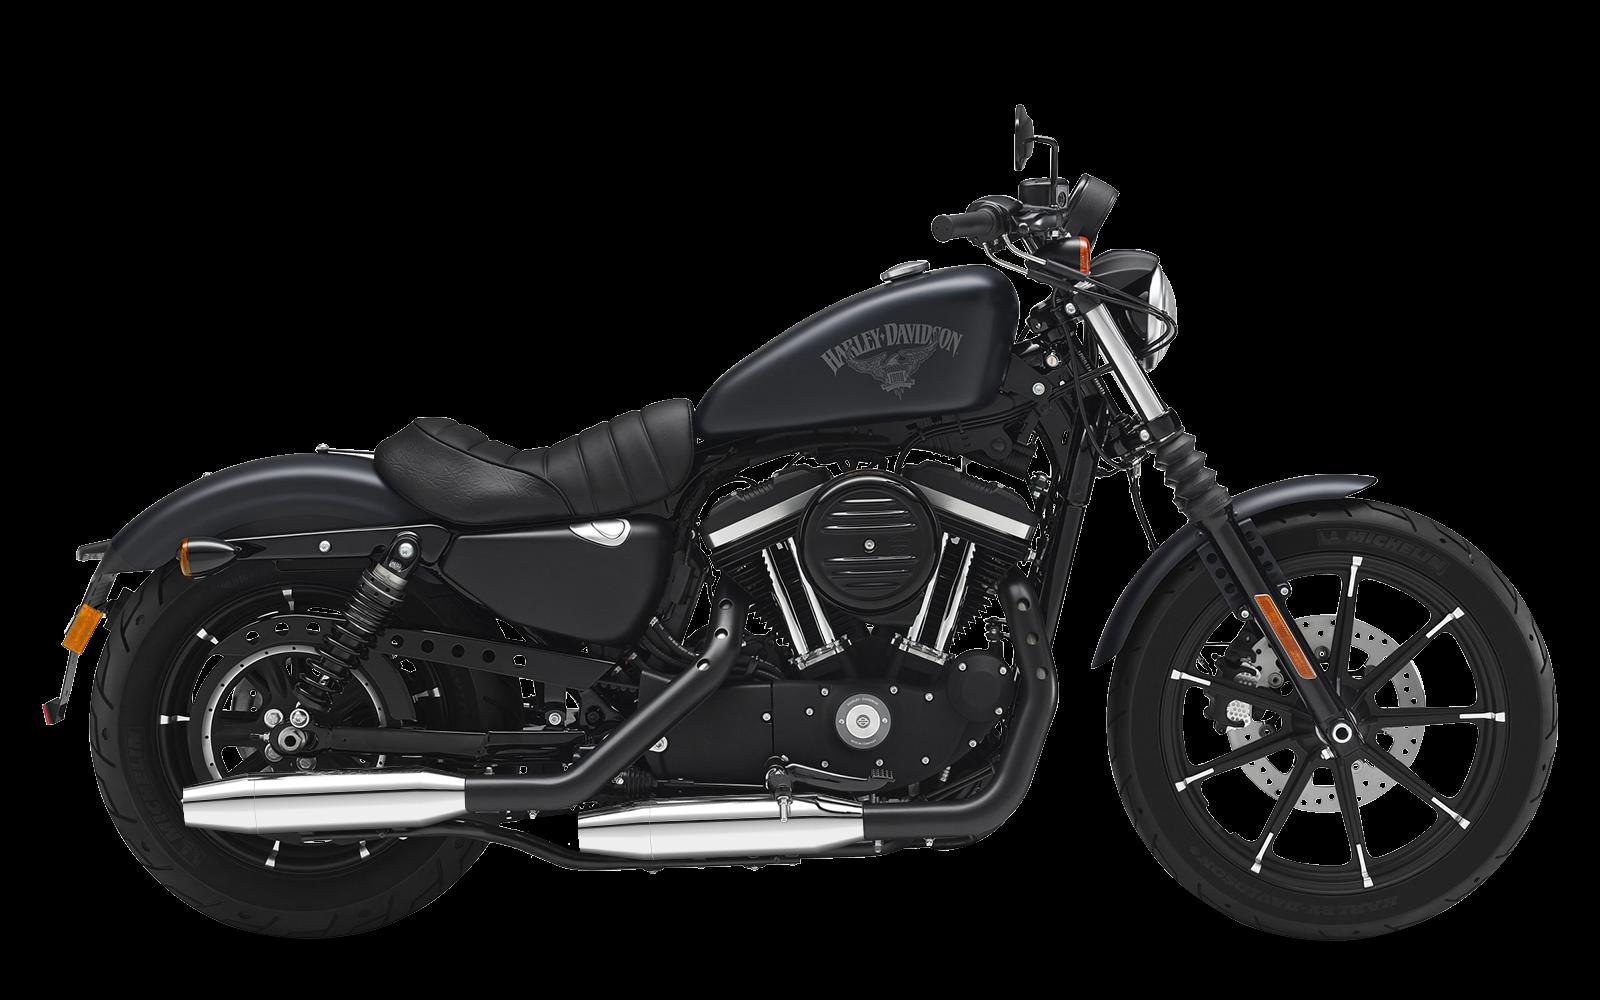 Sportster - Iron 883 - XL - 2014-2016 - Slipons adjustable